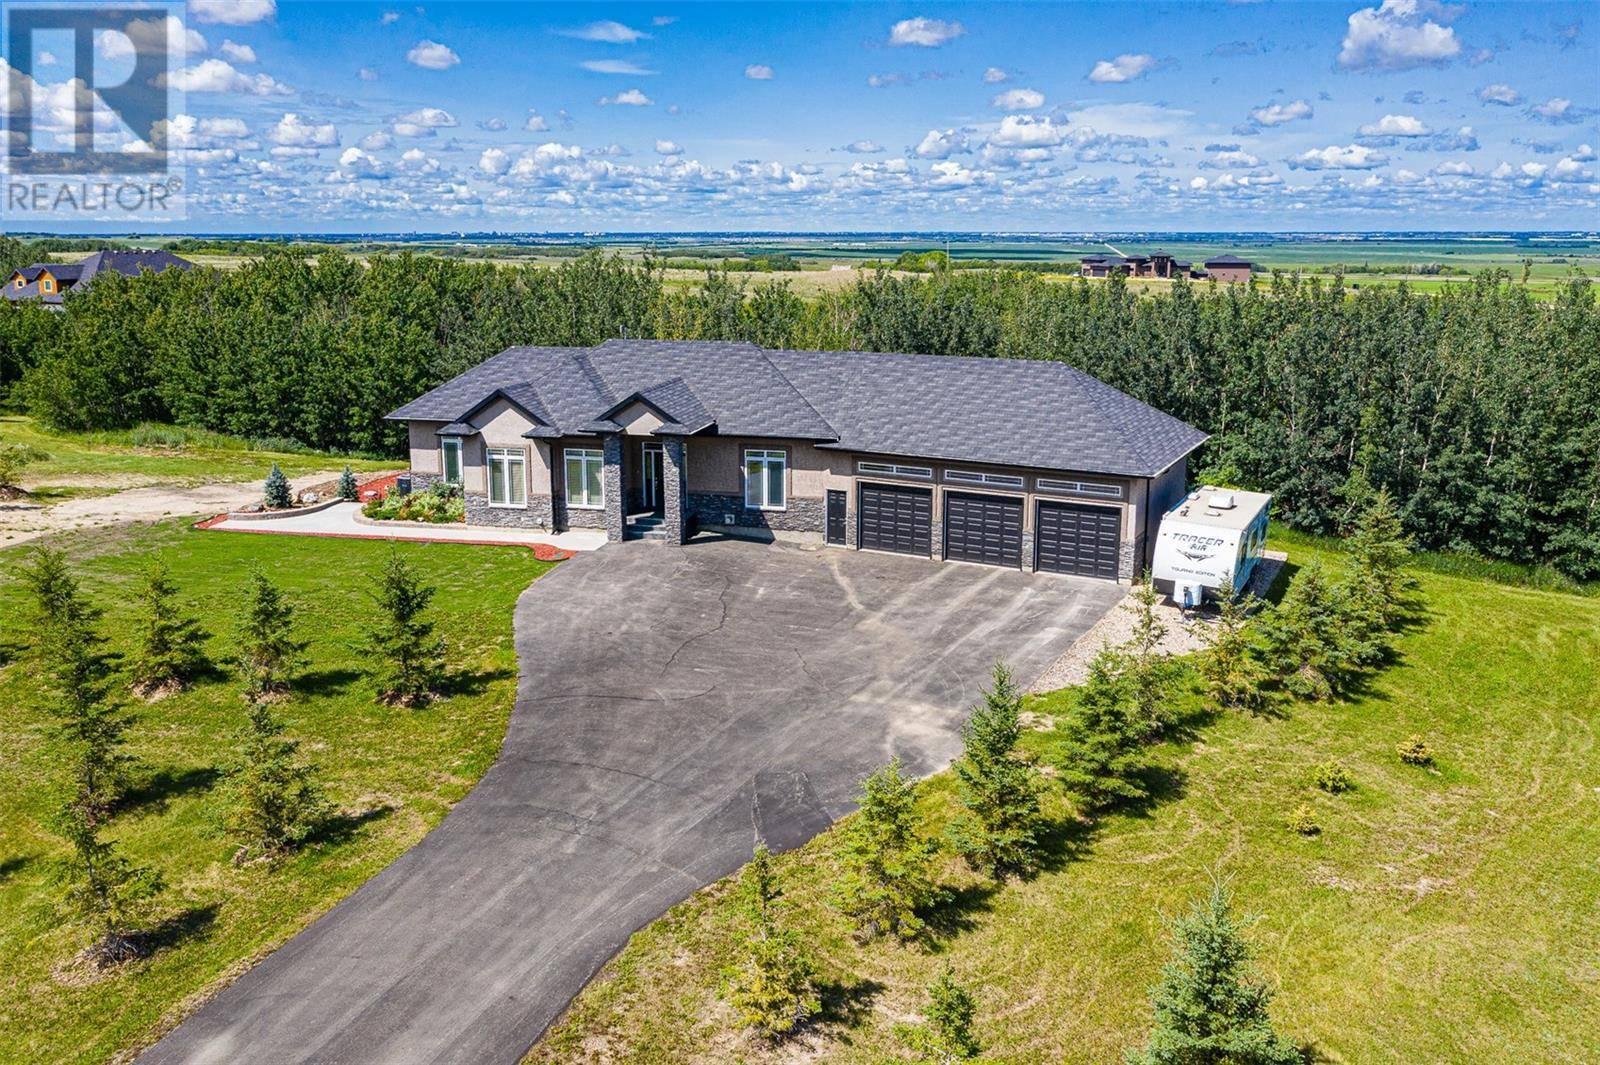 House for sale at 127 Mission Ridge Rd Aberdeen Rm No. 373 Saskatchewan - MLS: SK779218